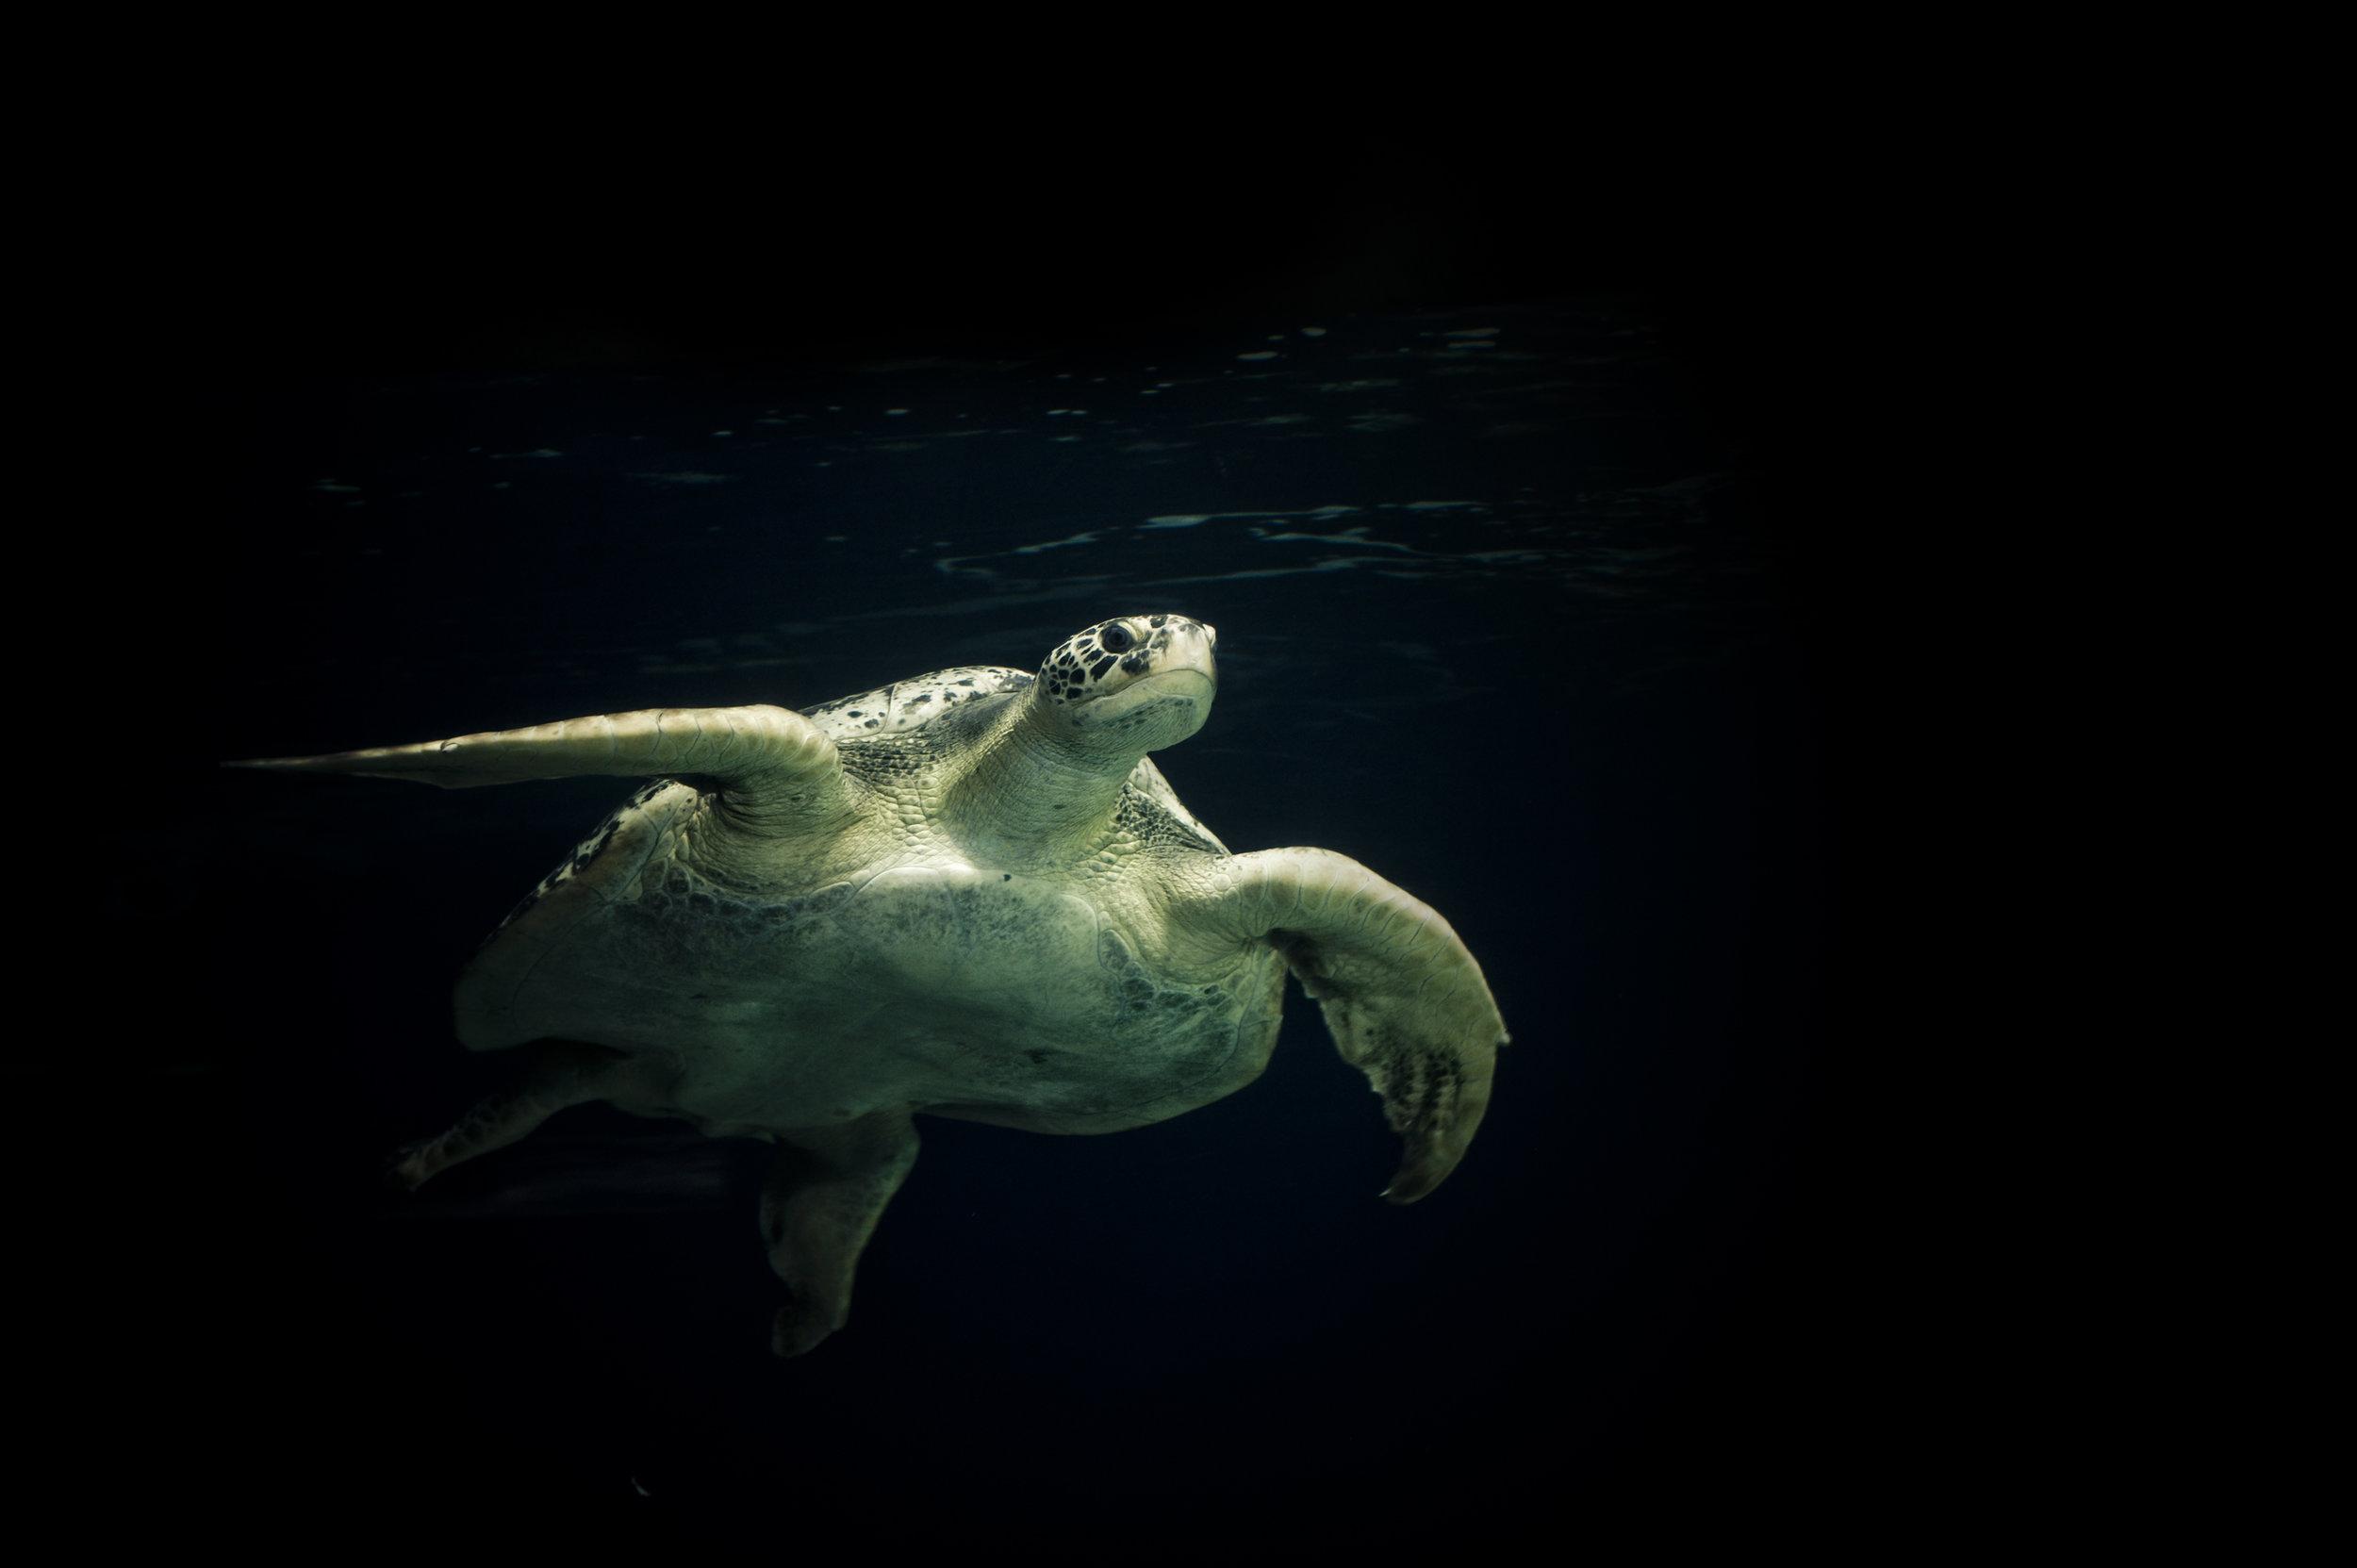 Turtle-of-the-Sea-182475565_3000x1996.jpeg